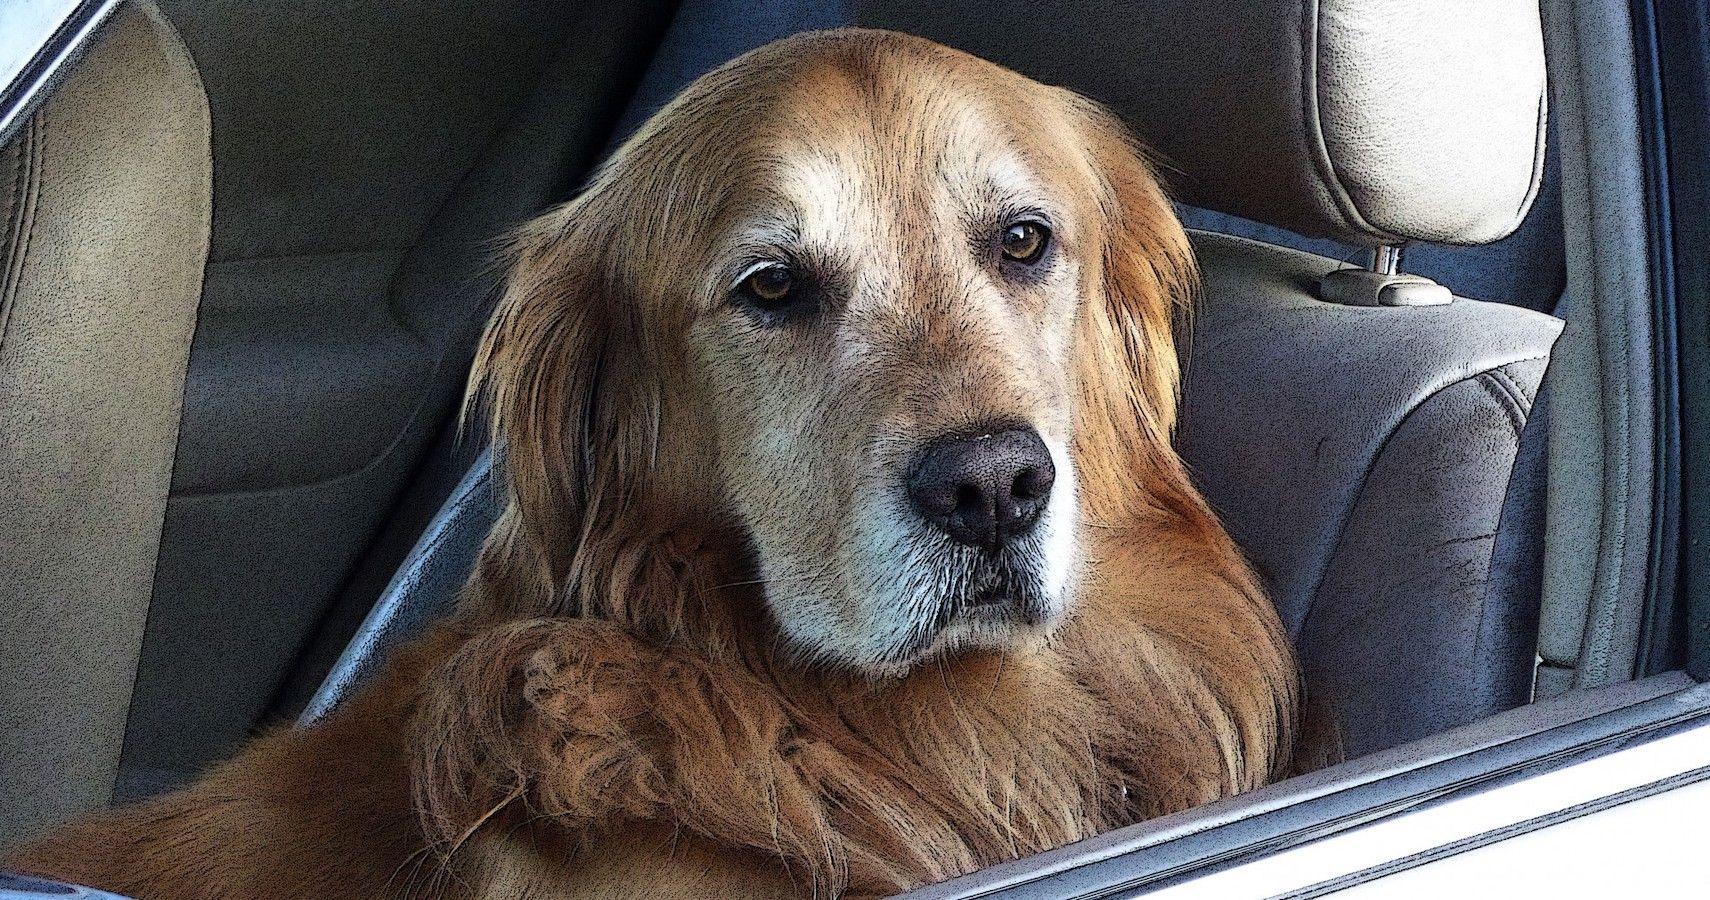 Forget Backup Cameras: World's Best Dog Helps Park A Car In Viral Video